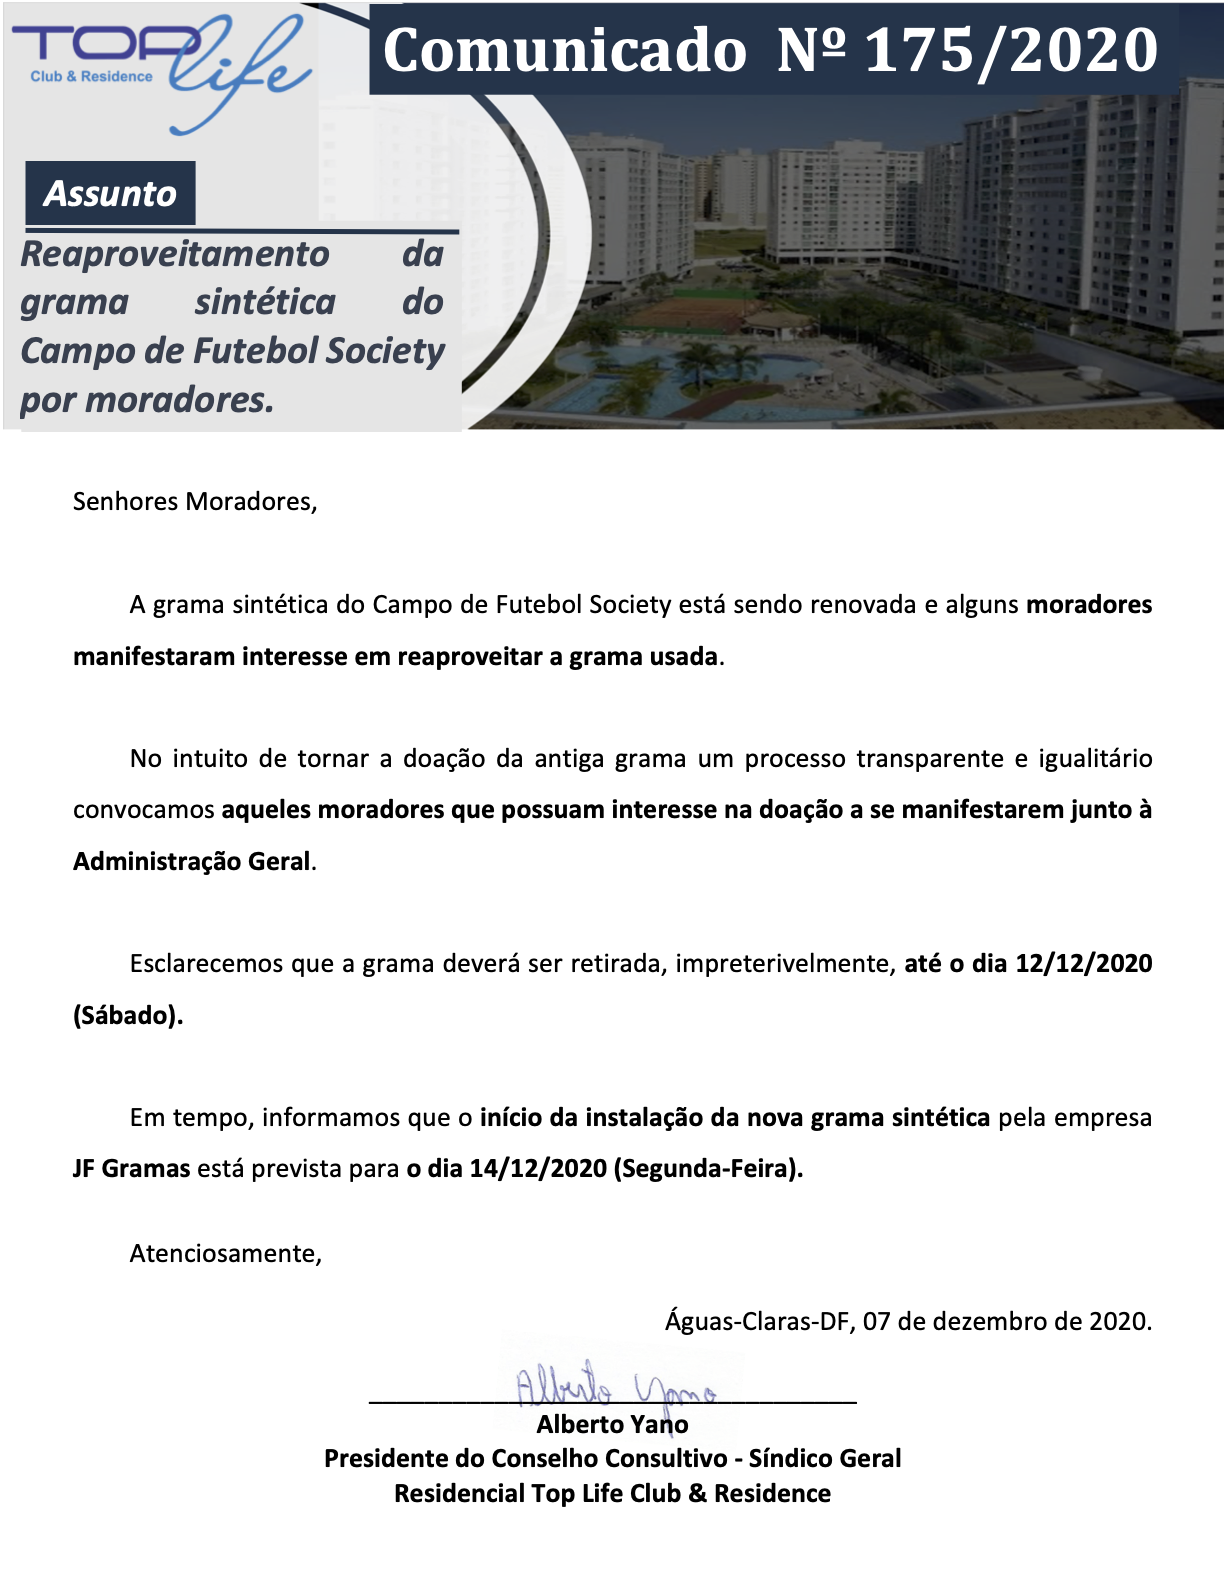 Comunicado 175/2020 - Reaproveitamento da grama sintética do Campo de Futebol Society por moradores